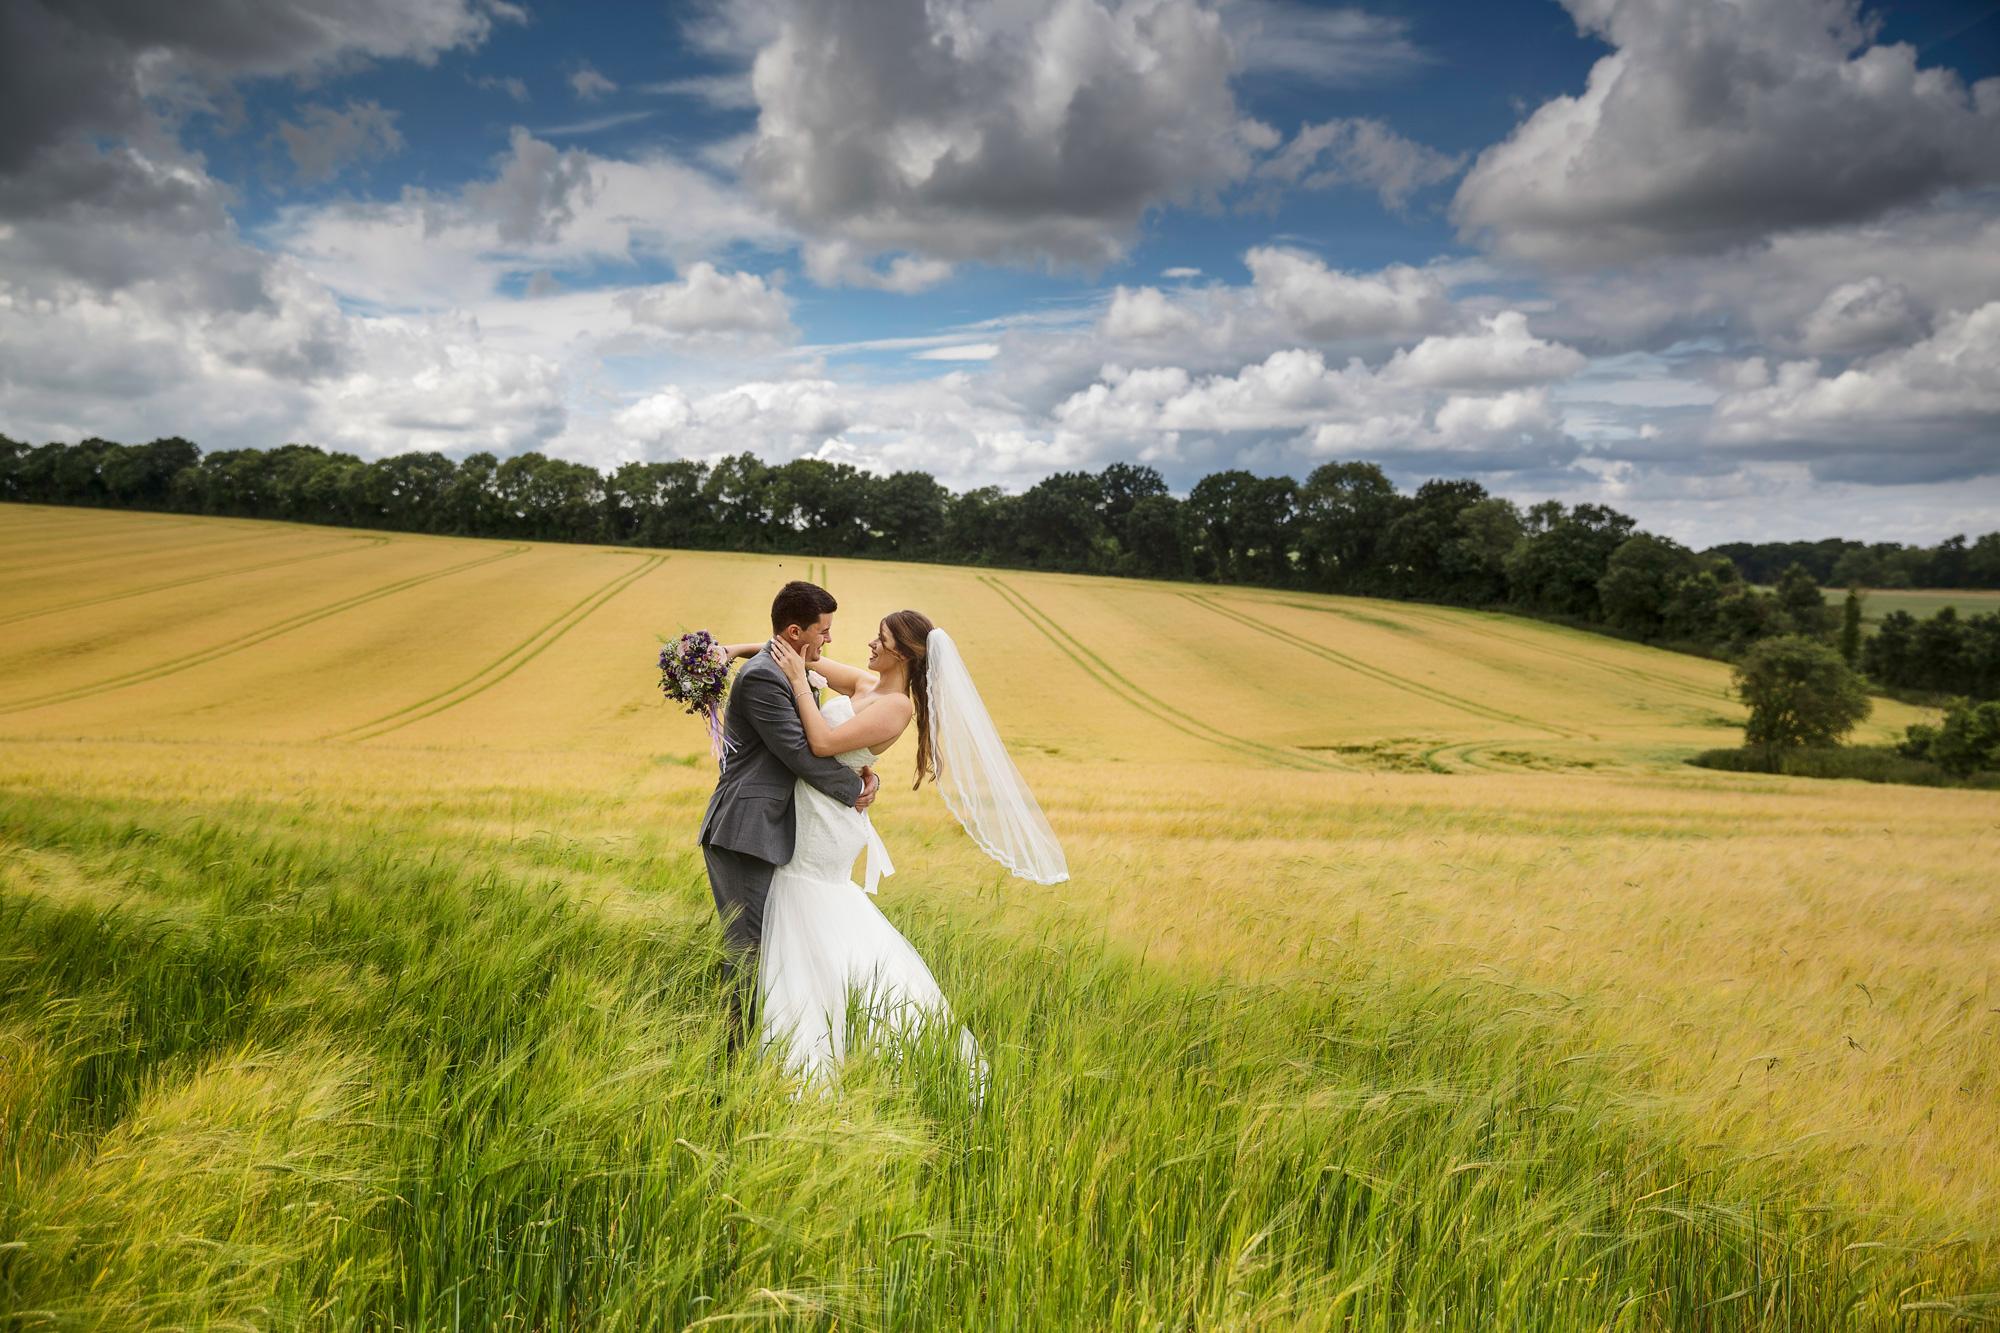 Adam_Hillier_Wedding_Photographer_Newbury_Berkshire_8 (9).jpg